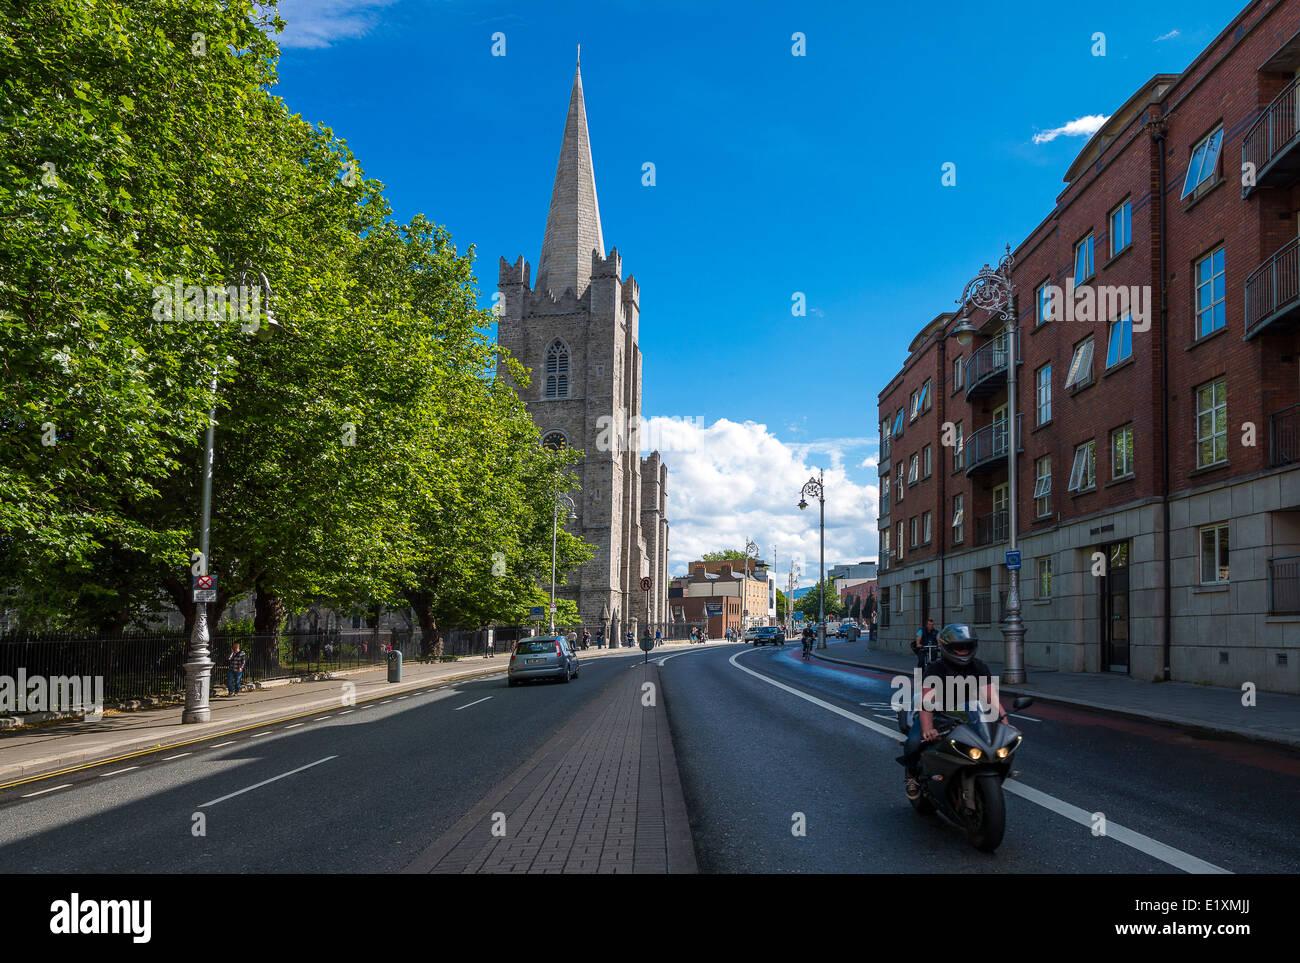 Ireland, Dublin, the St Patrik's cathedral - Stock Image